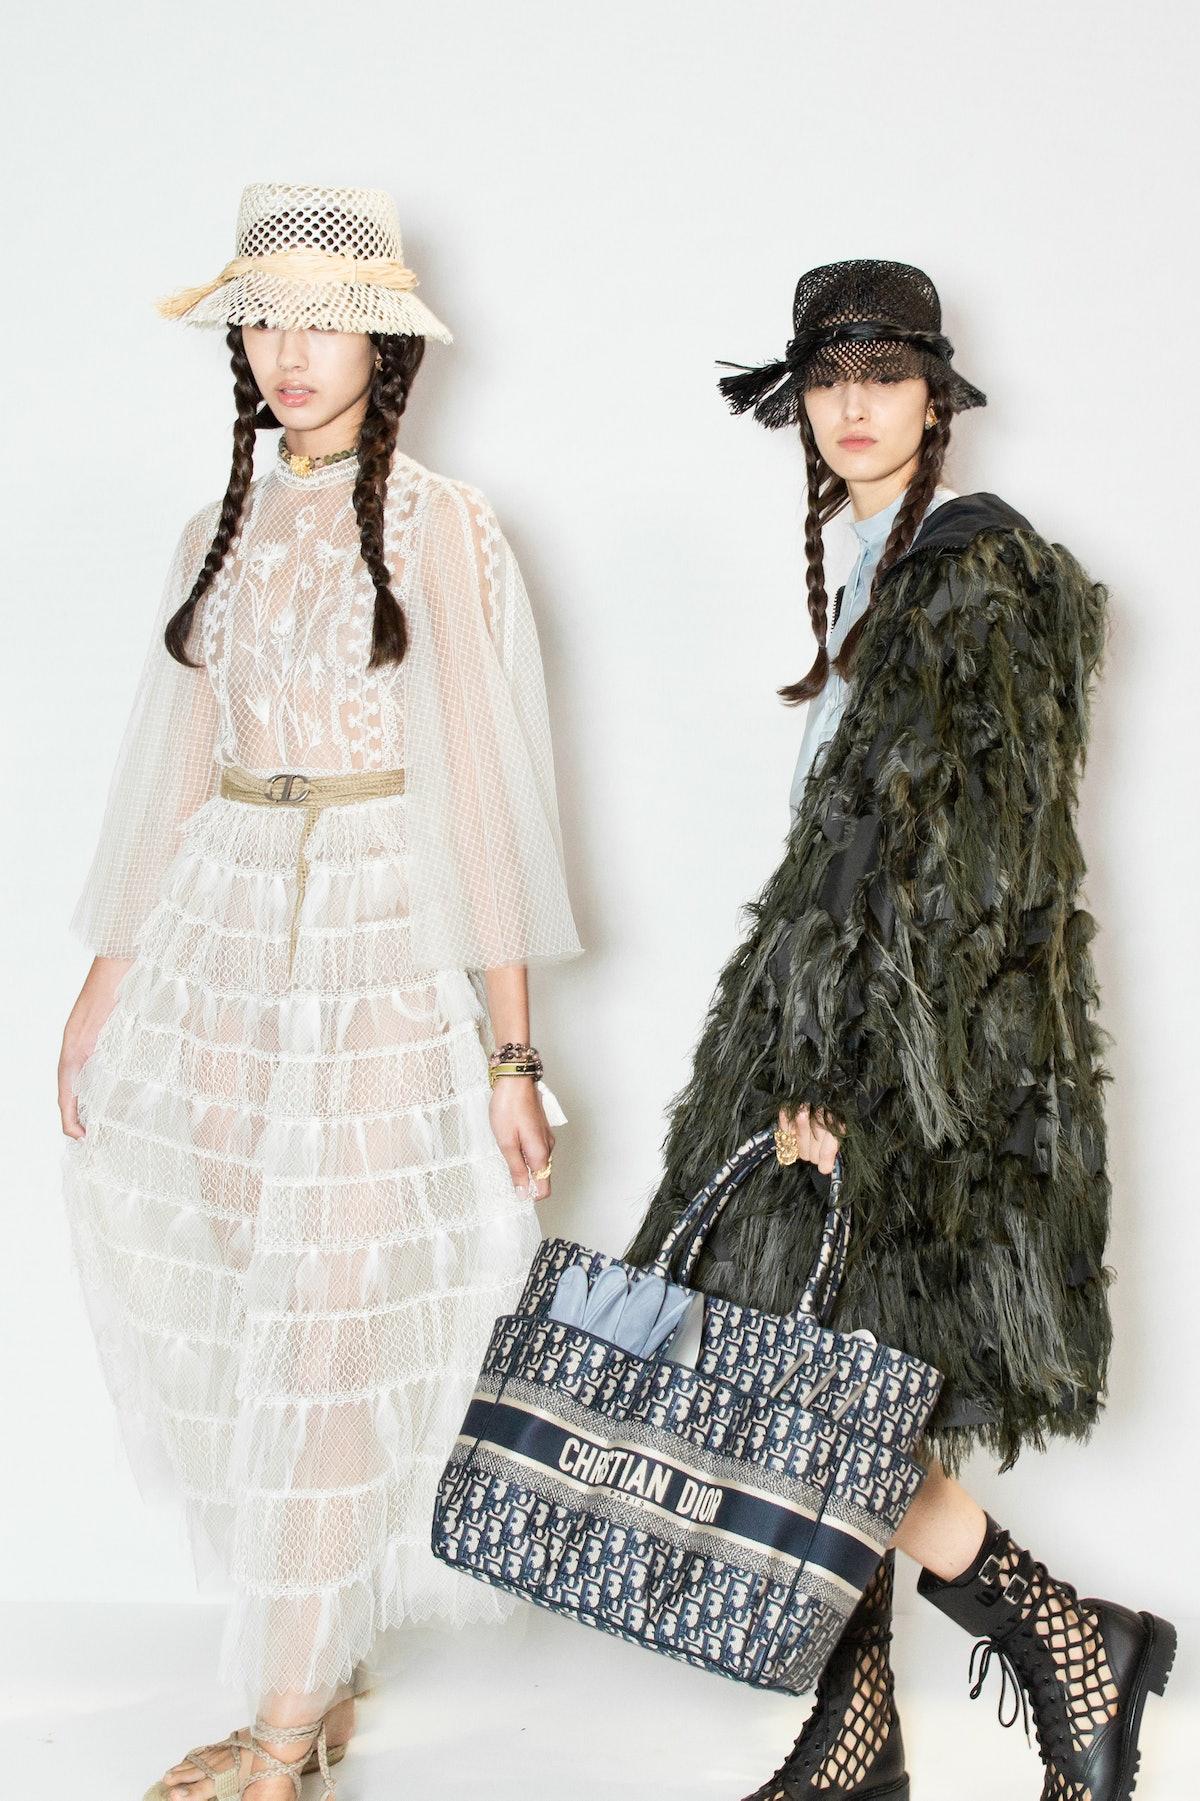 Serichai_Dior_BTS-138.jpg